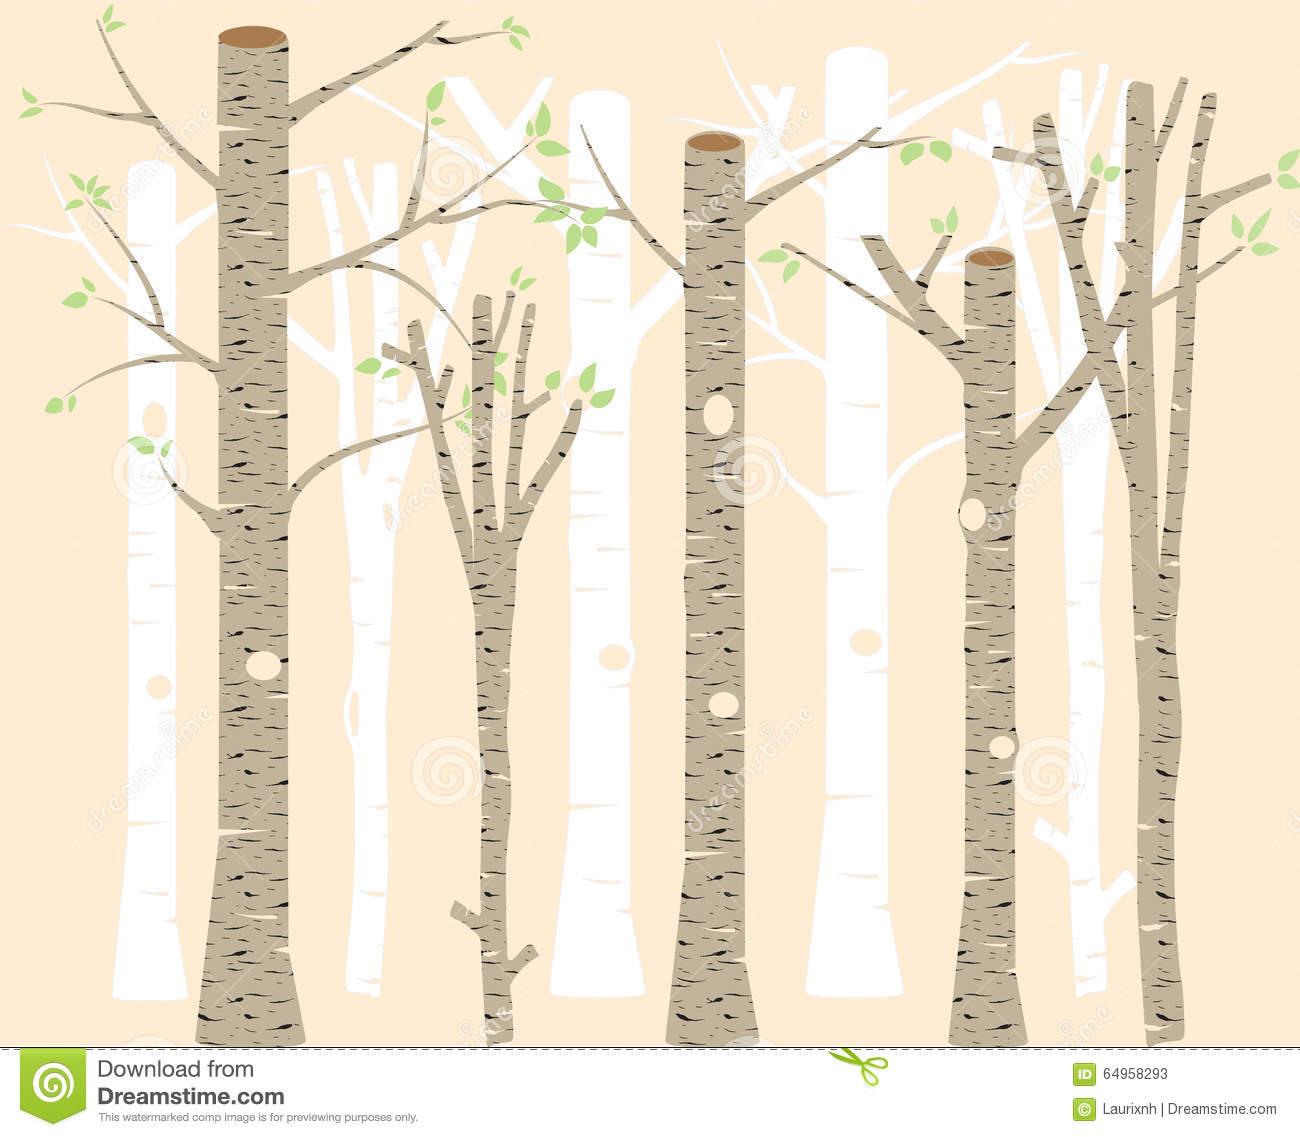 Birch Clip Art , Trees Illustration, Woodland, Birch Silhouettes.